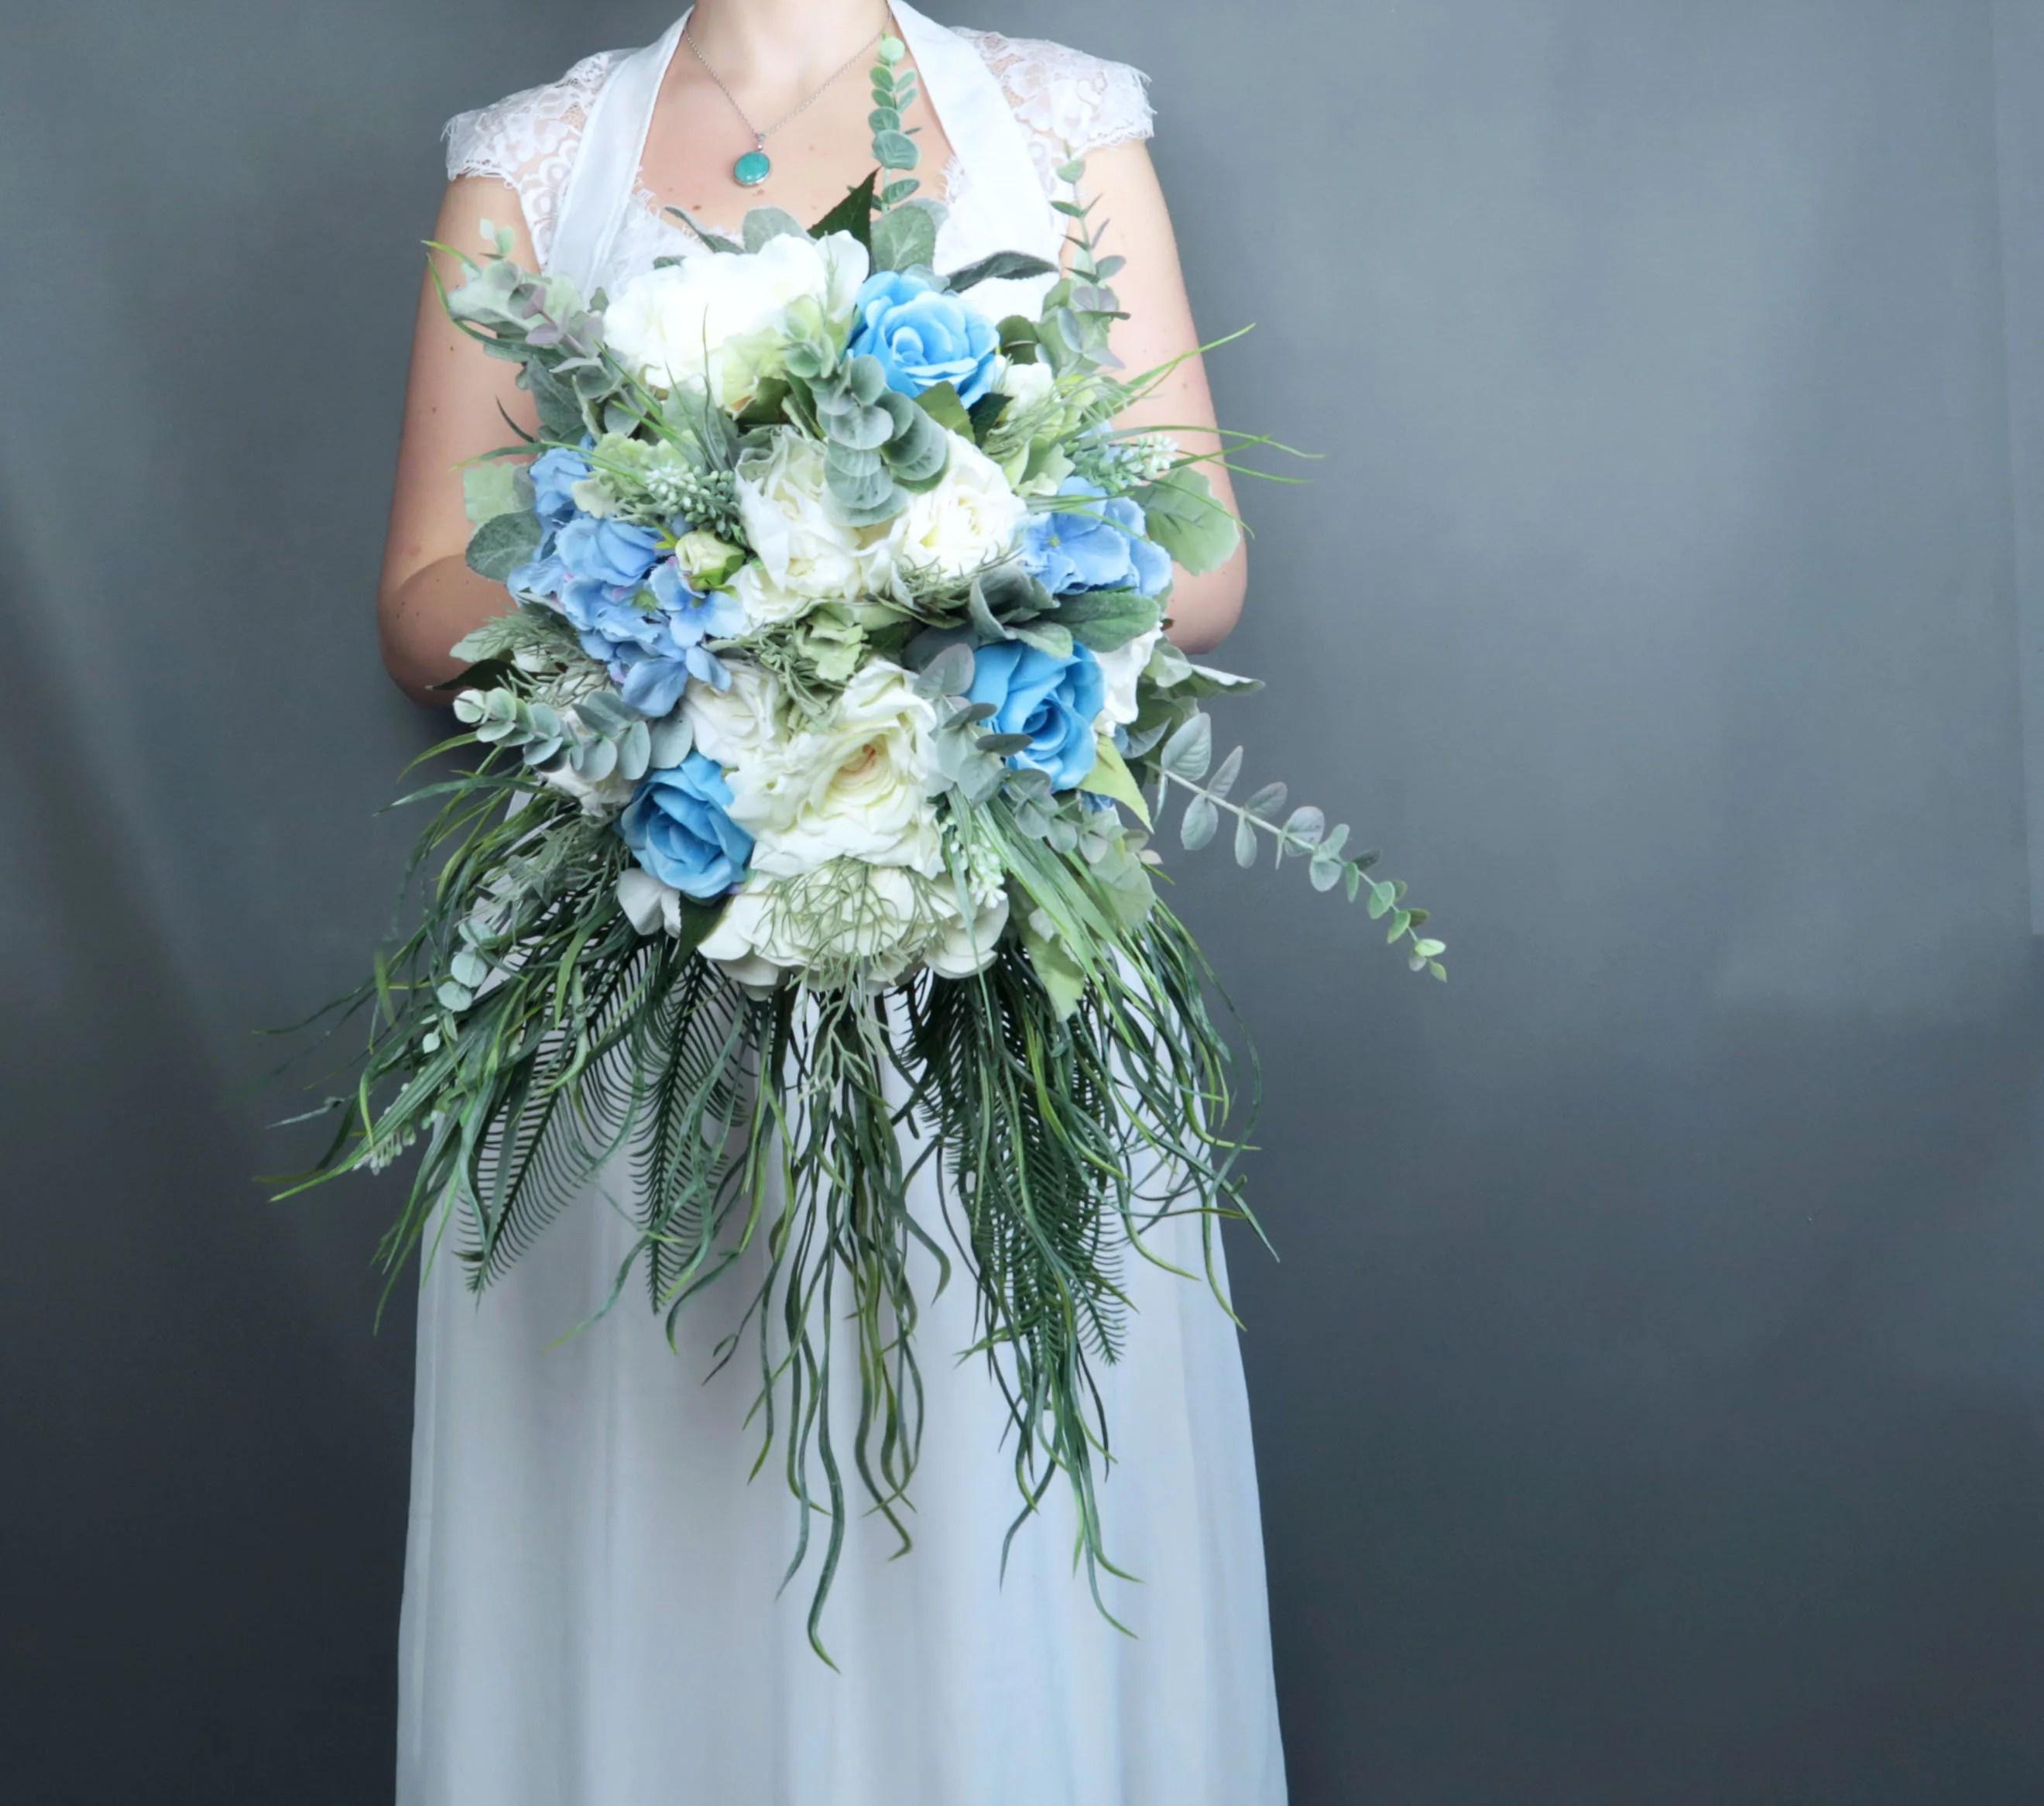 Cascading Greenery Pastel Blue White Ivory Flowers Bridal Bouquet